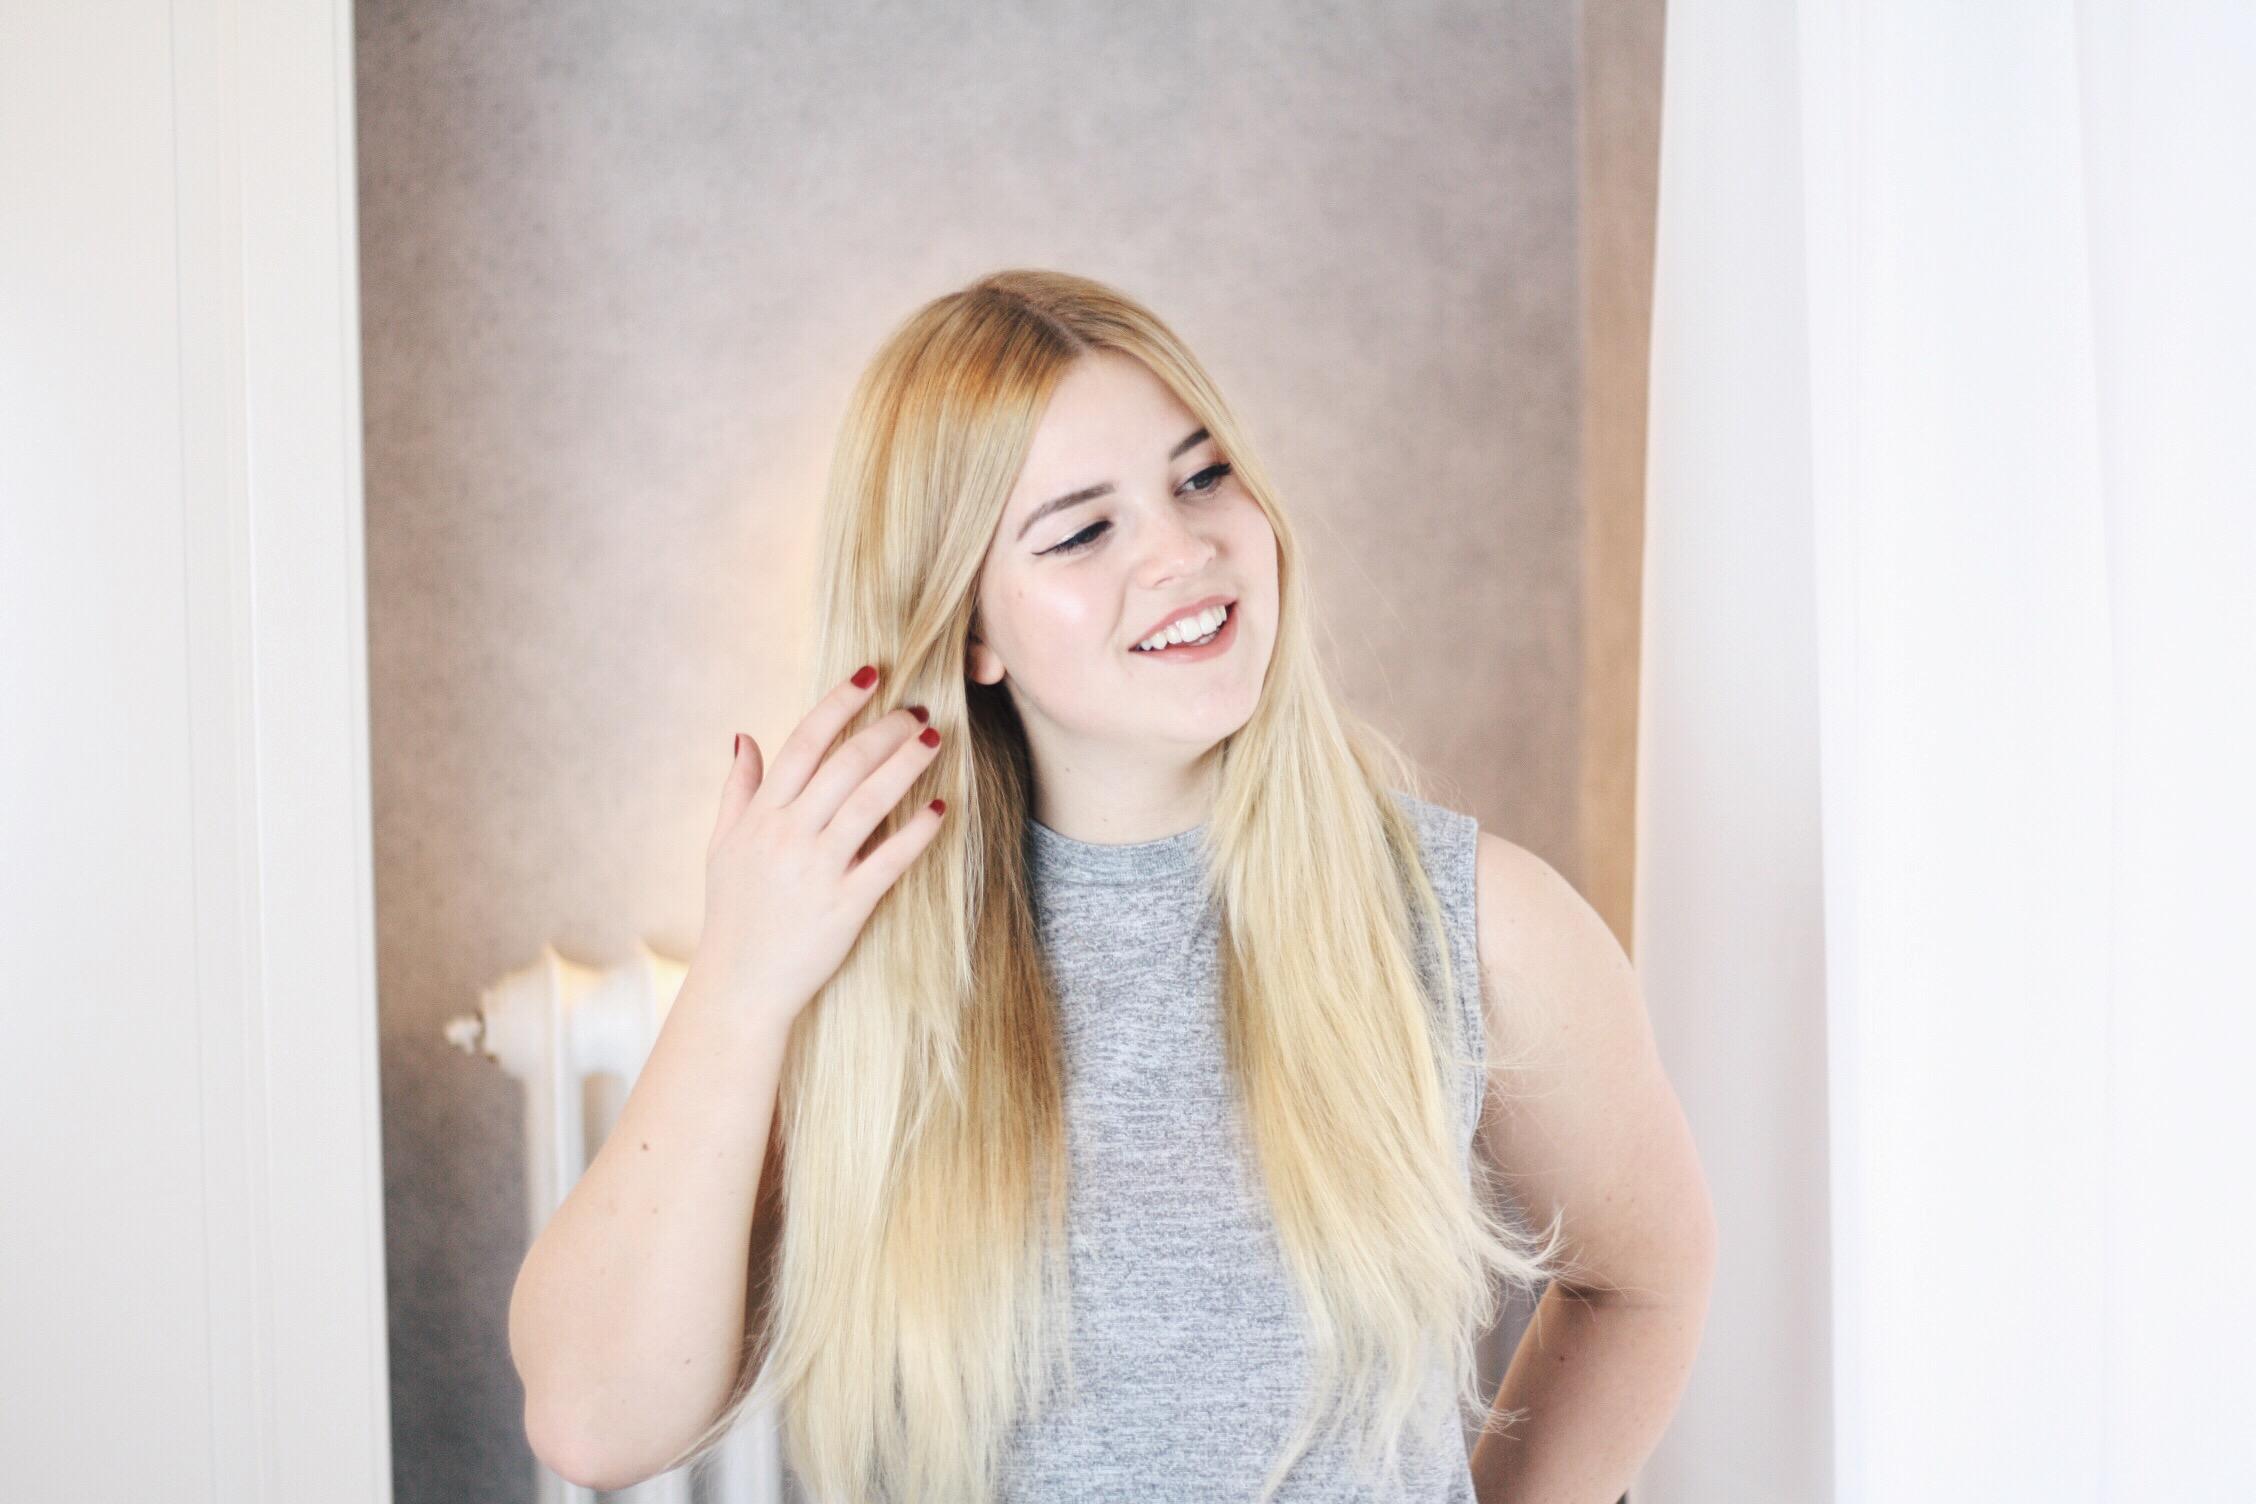 modeblogger_beautryblogger_hannover_hamburg_itsgoldie_extensions_clip-in_lange_haare_blond